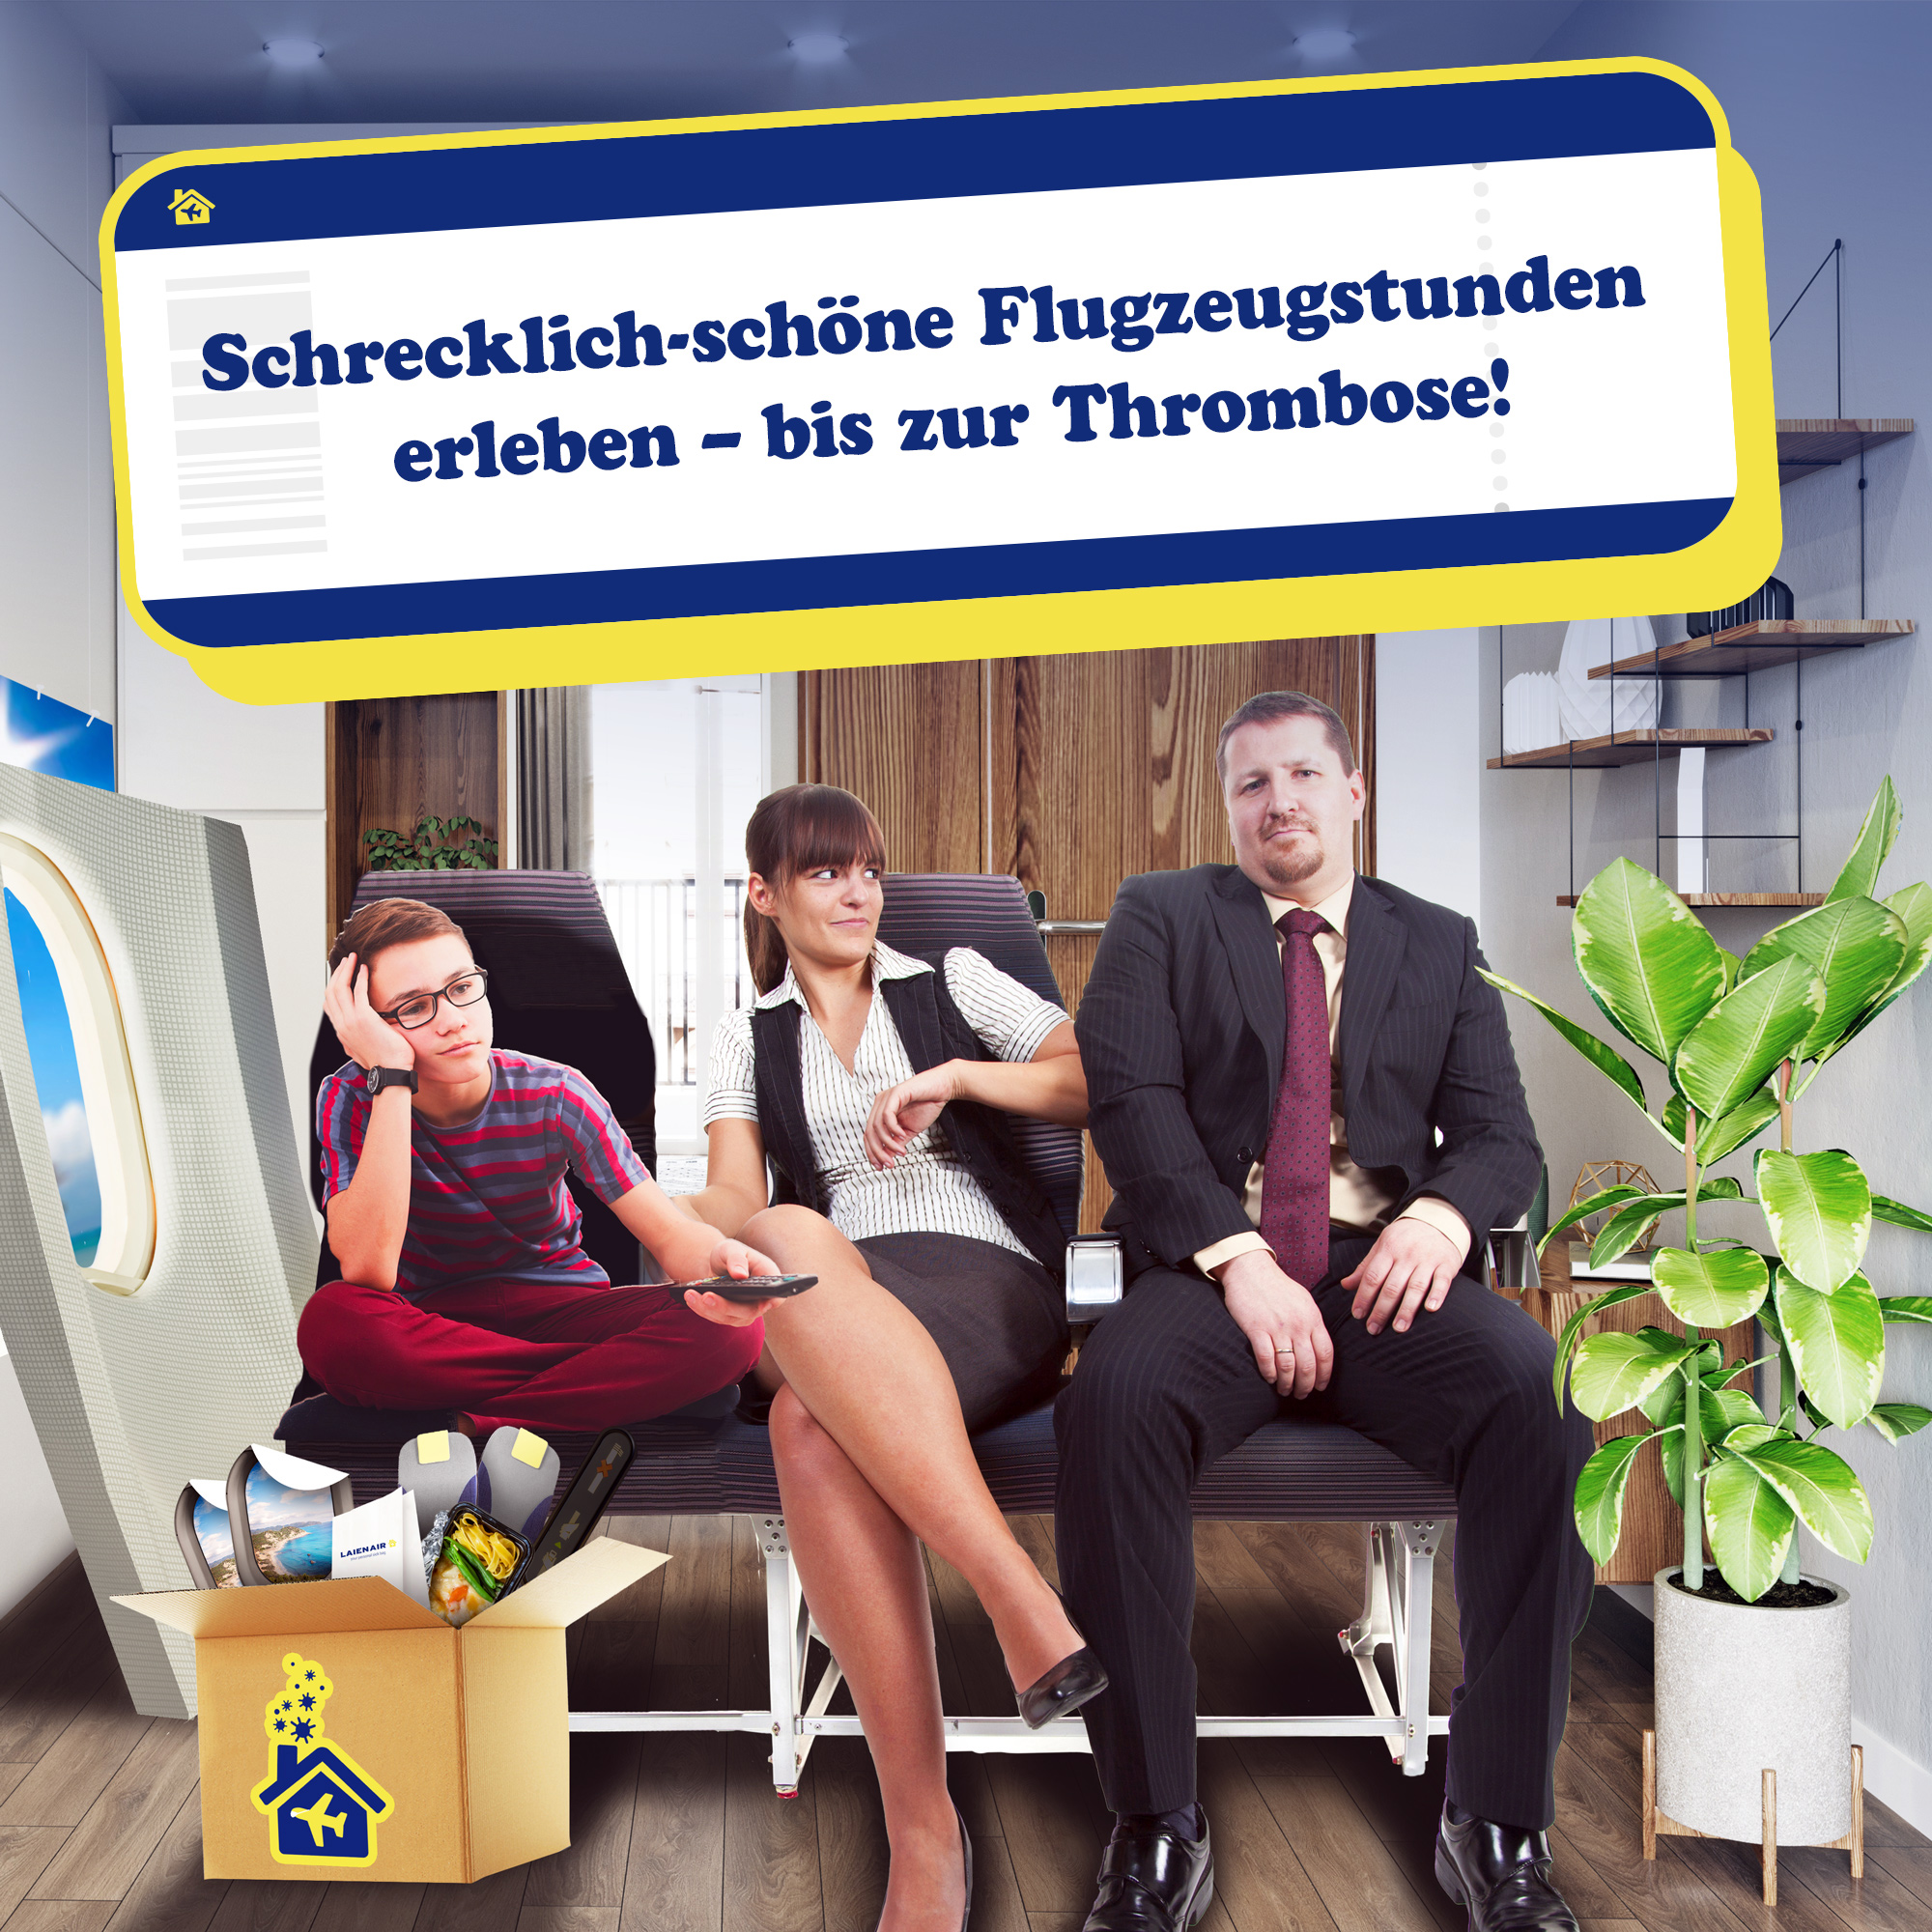 Flug-Reisetag für Zuhause